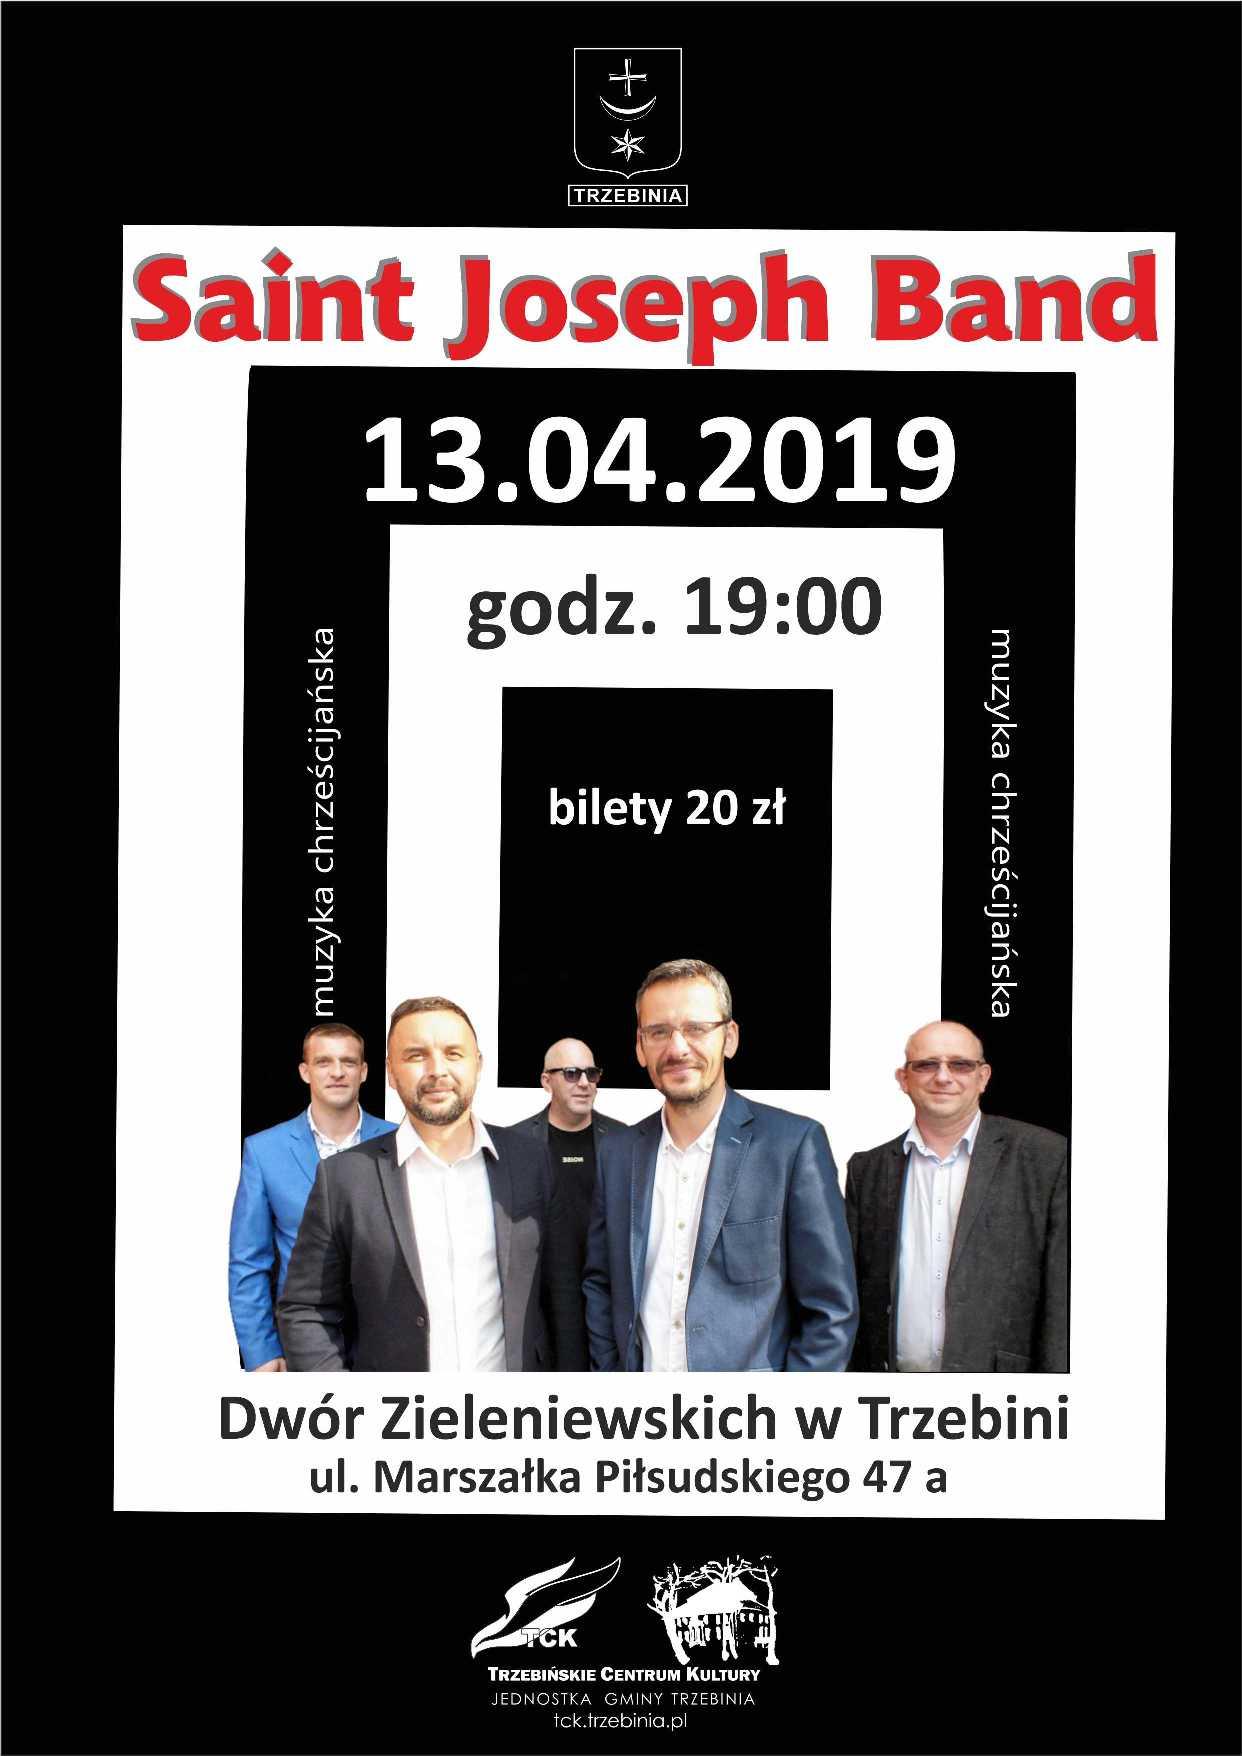 saint joseph band